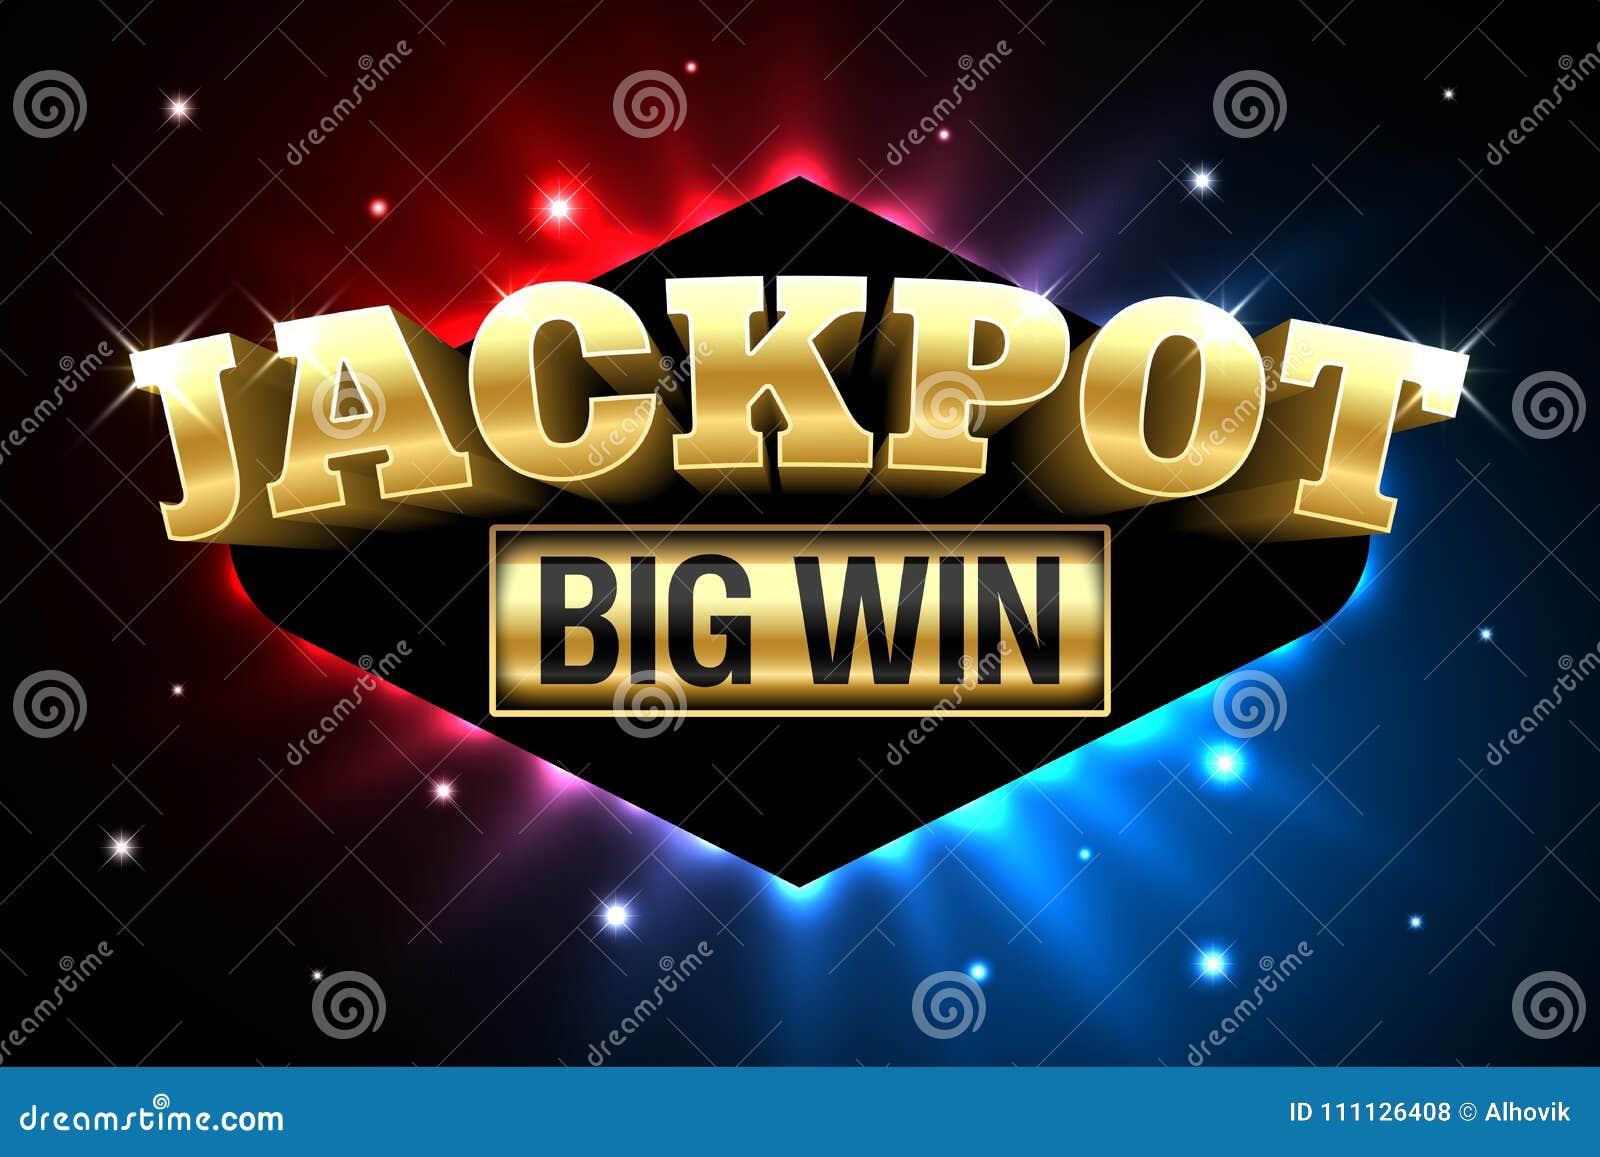 Jackpot Casino Banner Big Win Stock Vector Illustration Of